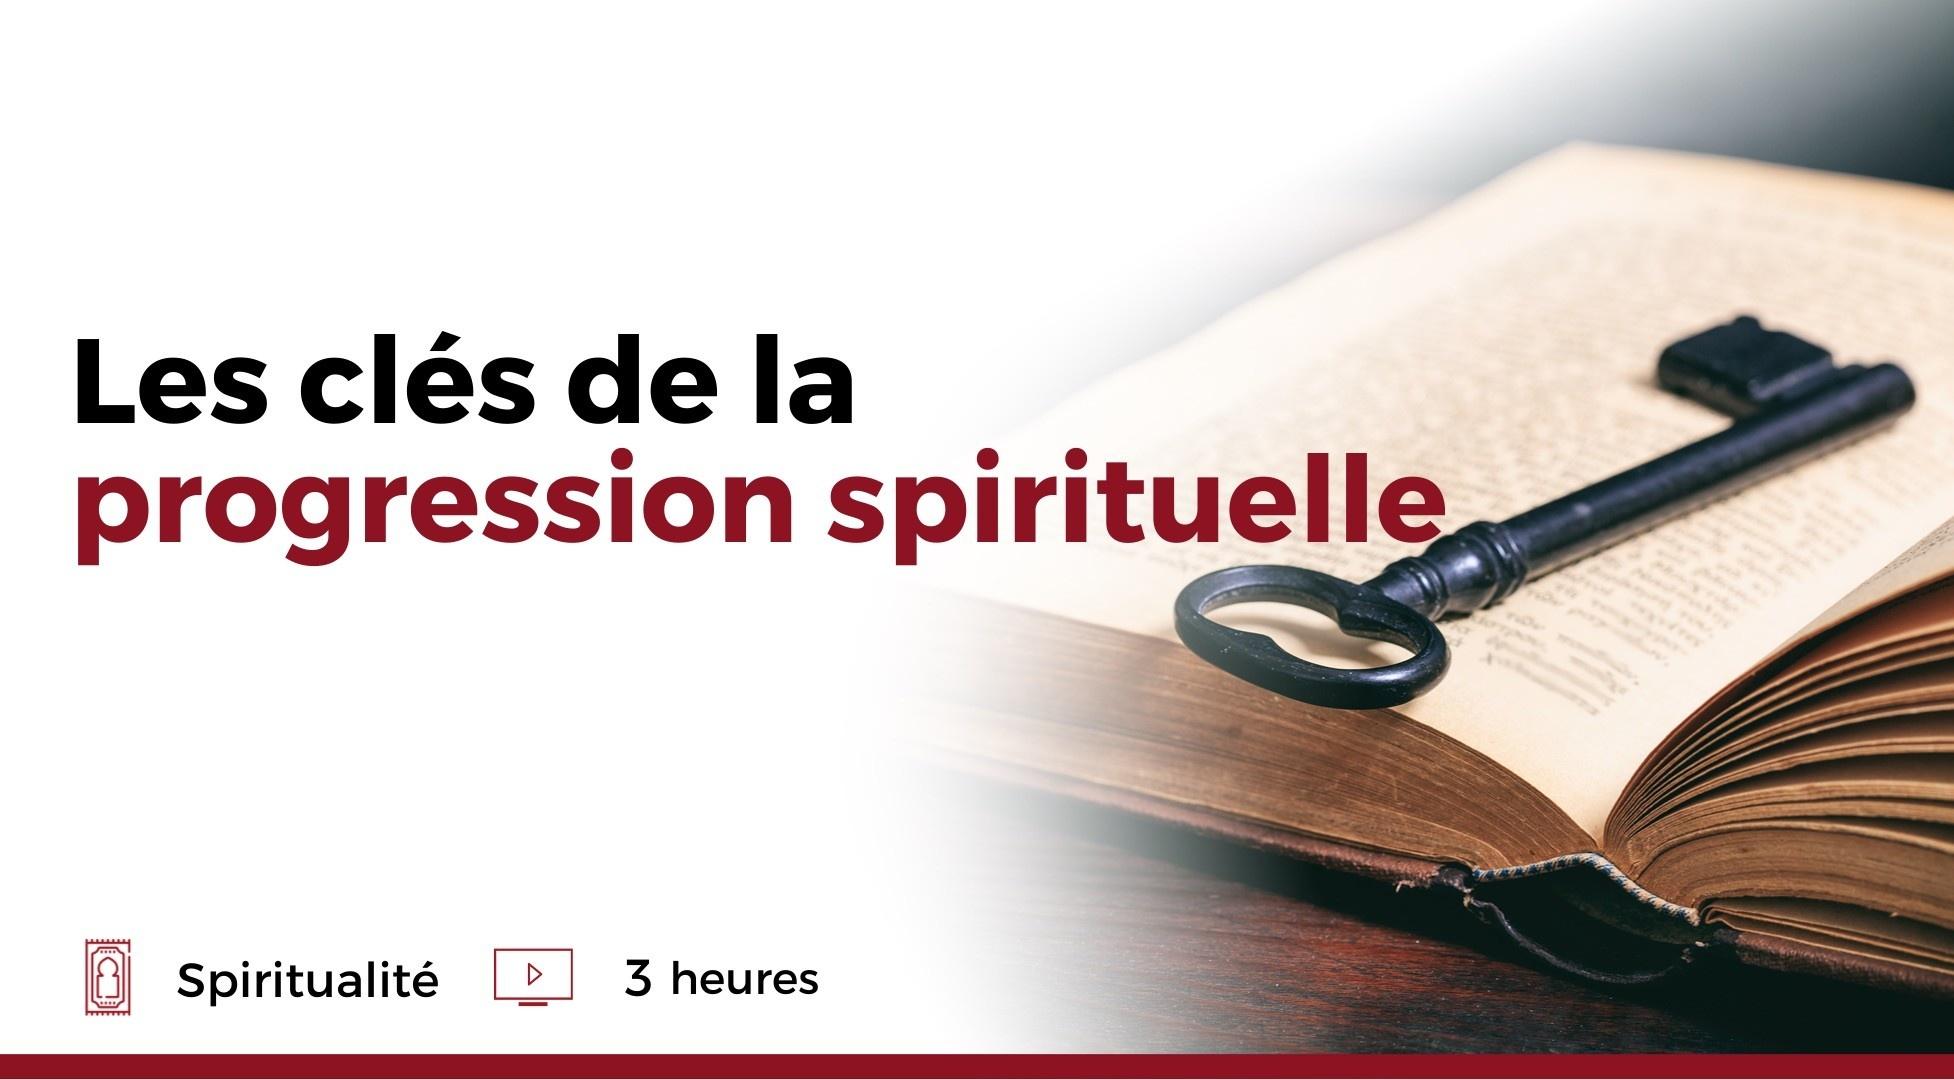 Les clés de la progression spirituelle